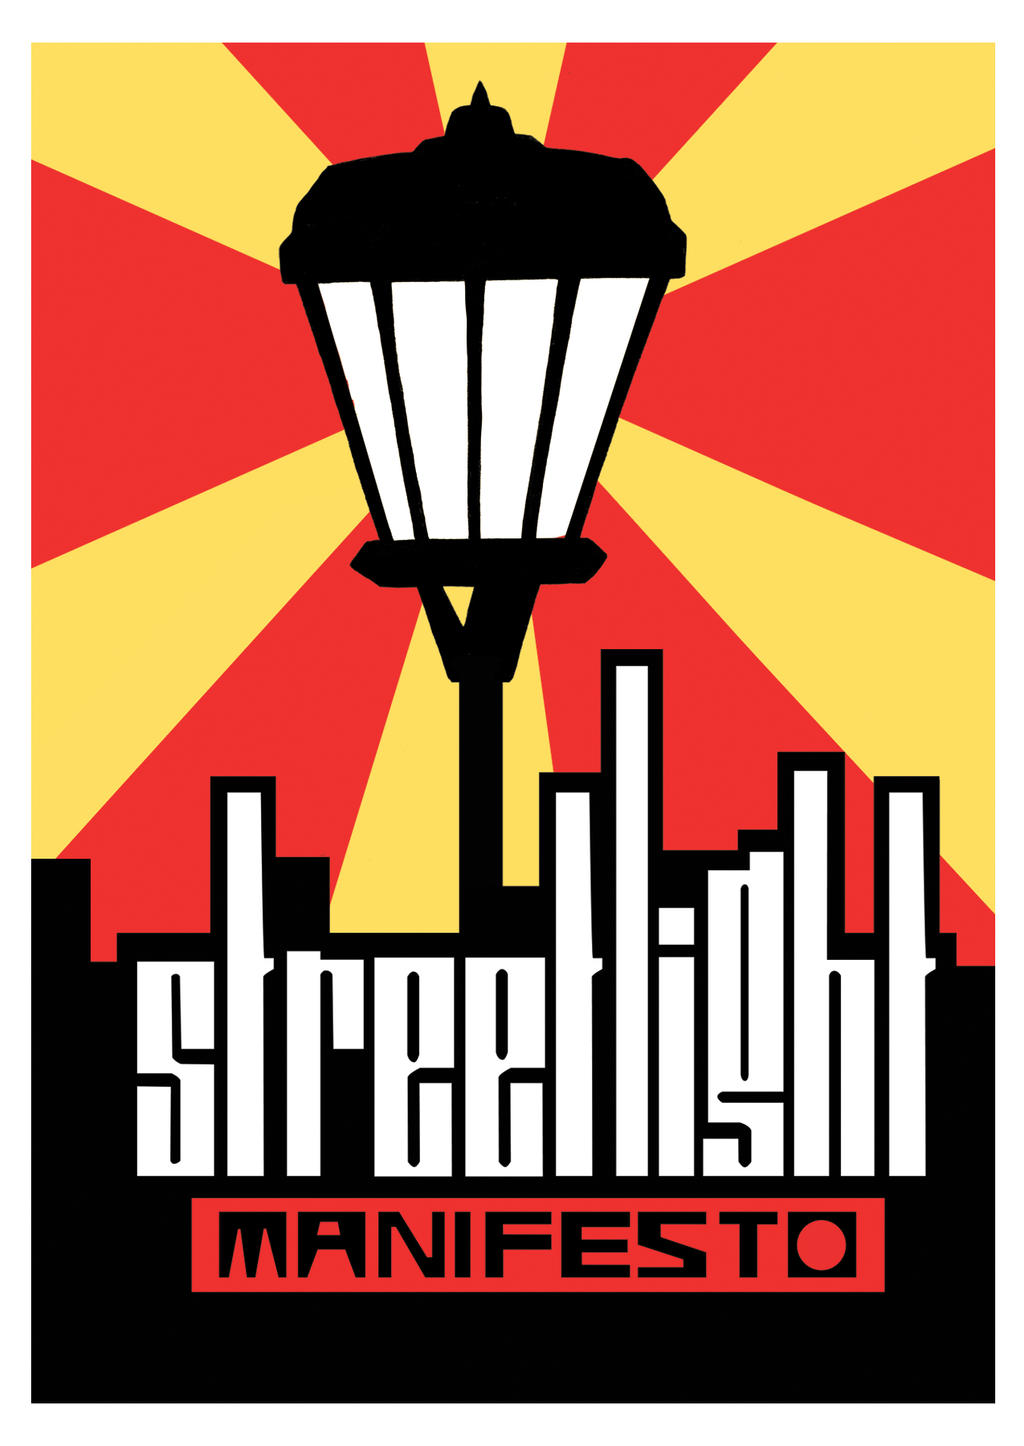 Street Light Manifesto  Tour